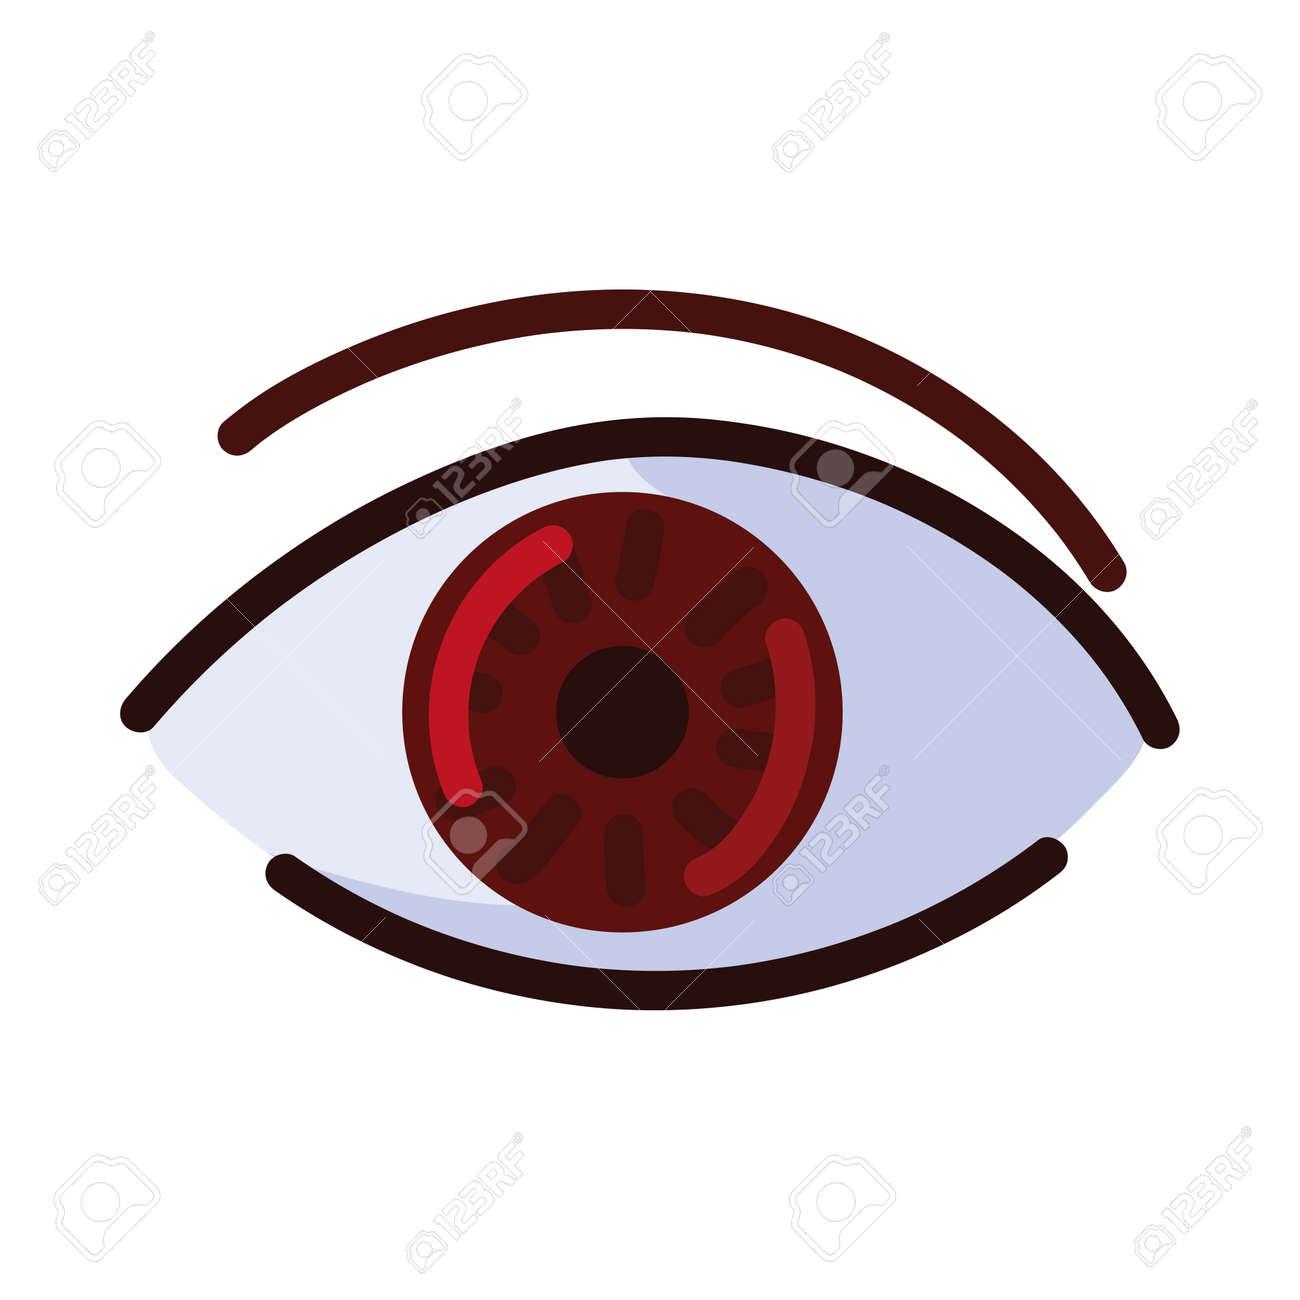 cyber surveillance eye - 169904279